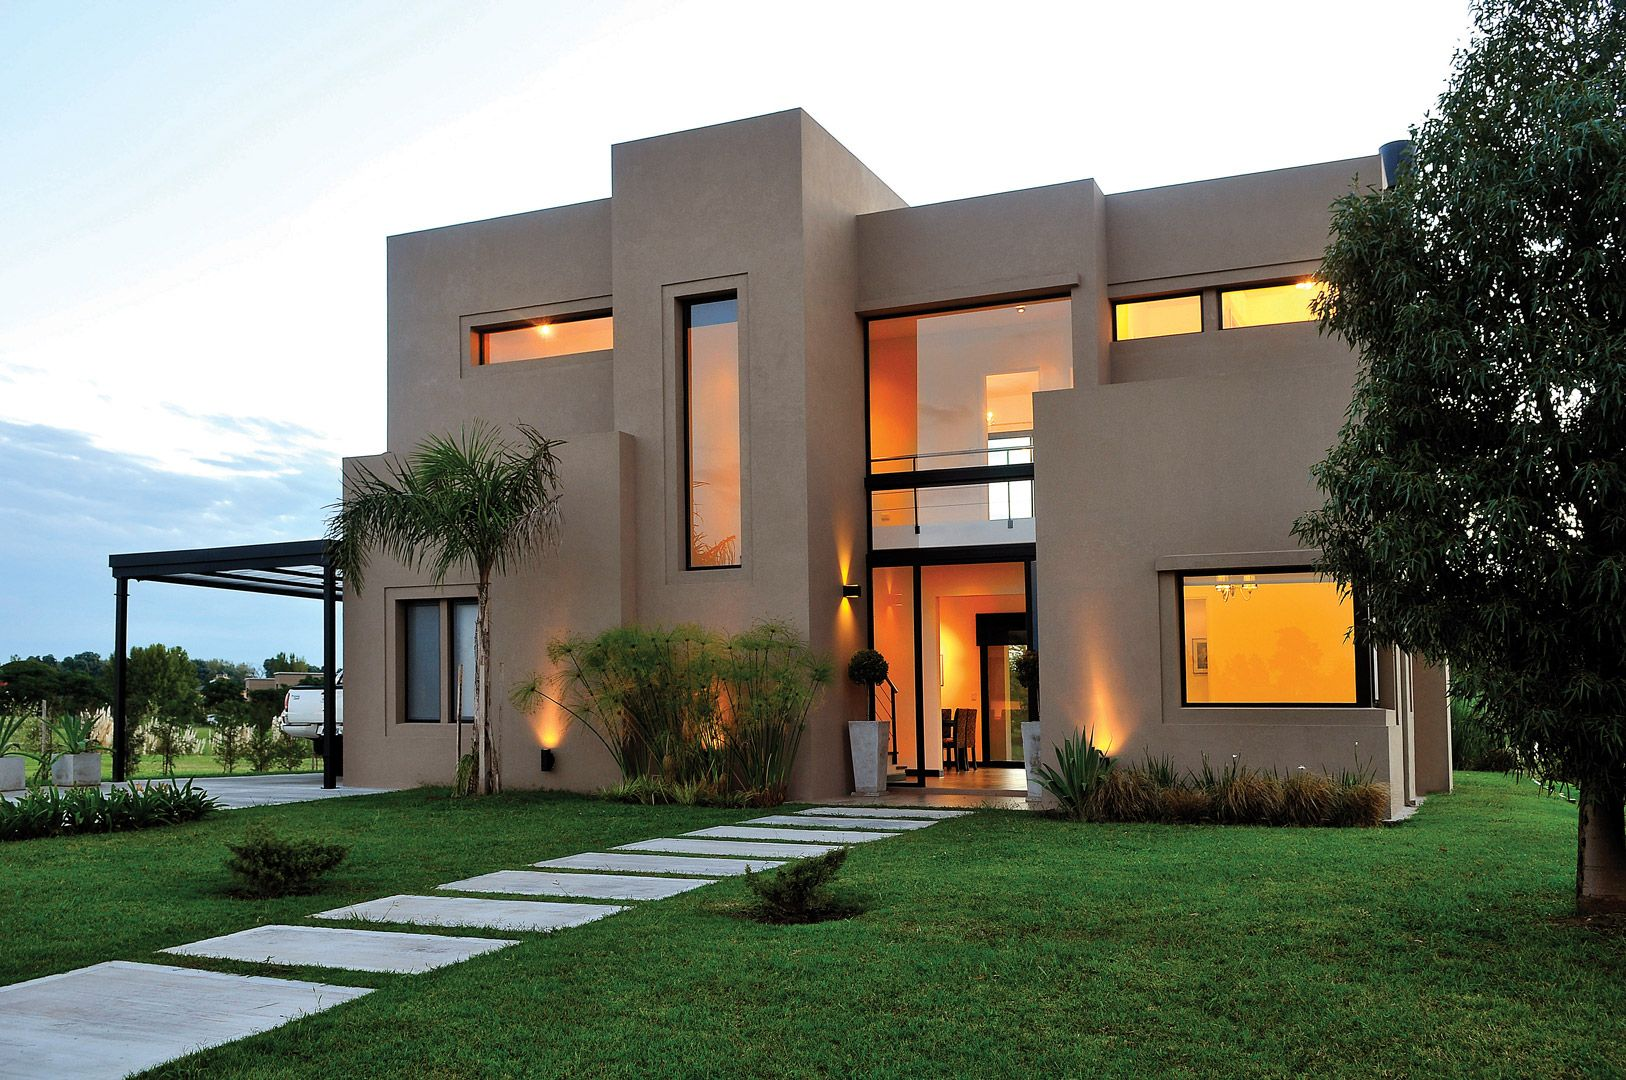 Marcela parrado arquitectura arquitectura casas portal for Casas clasicas fotos